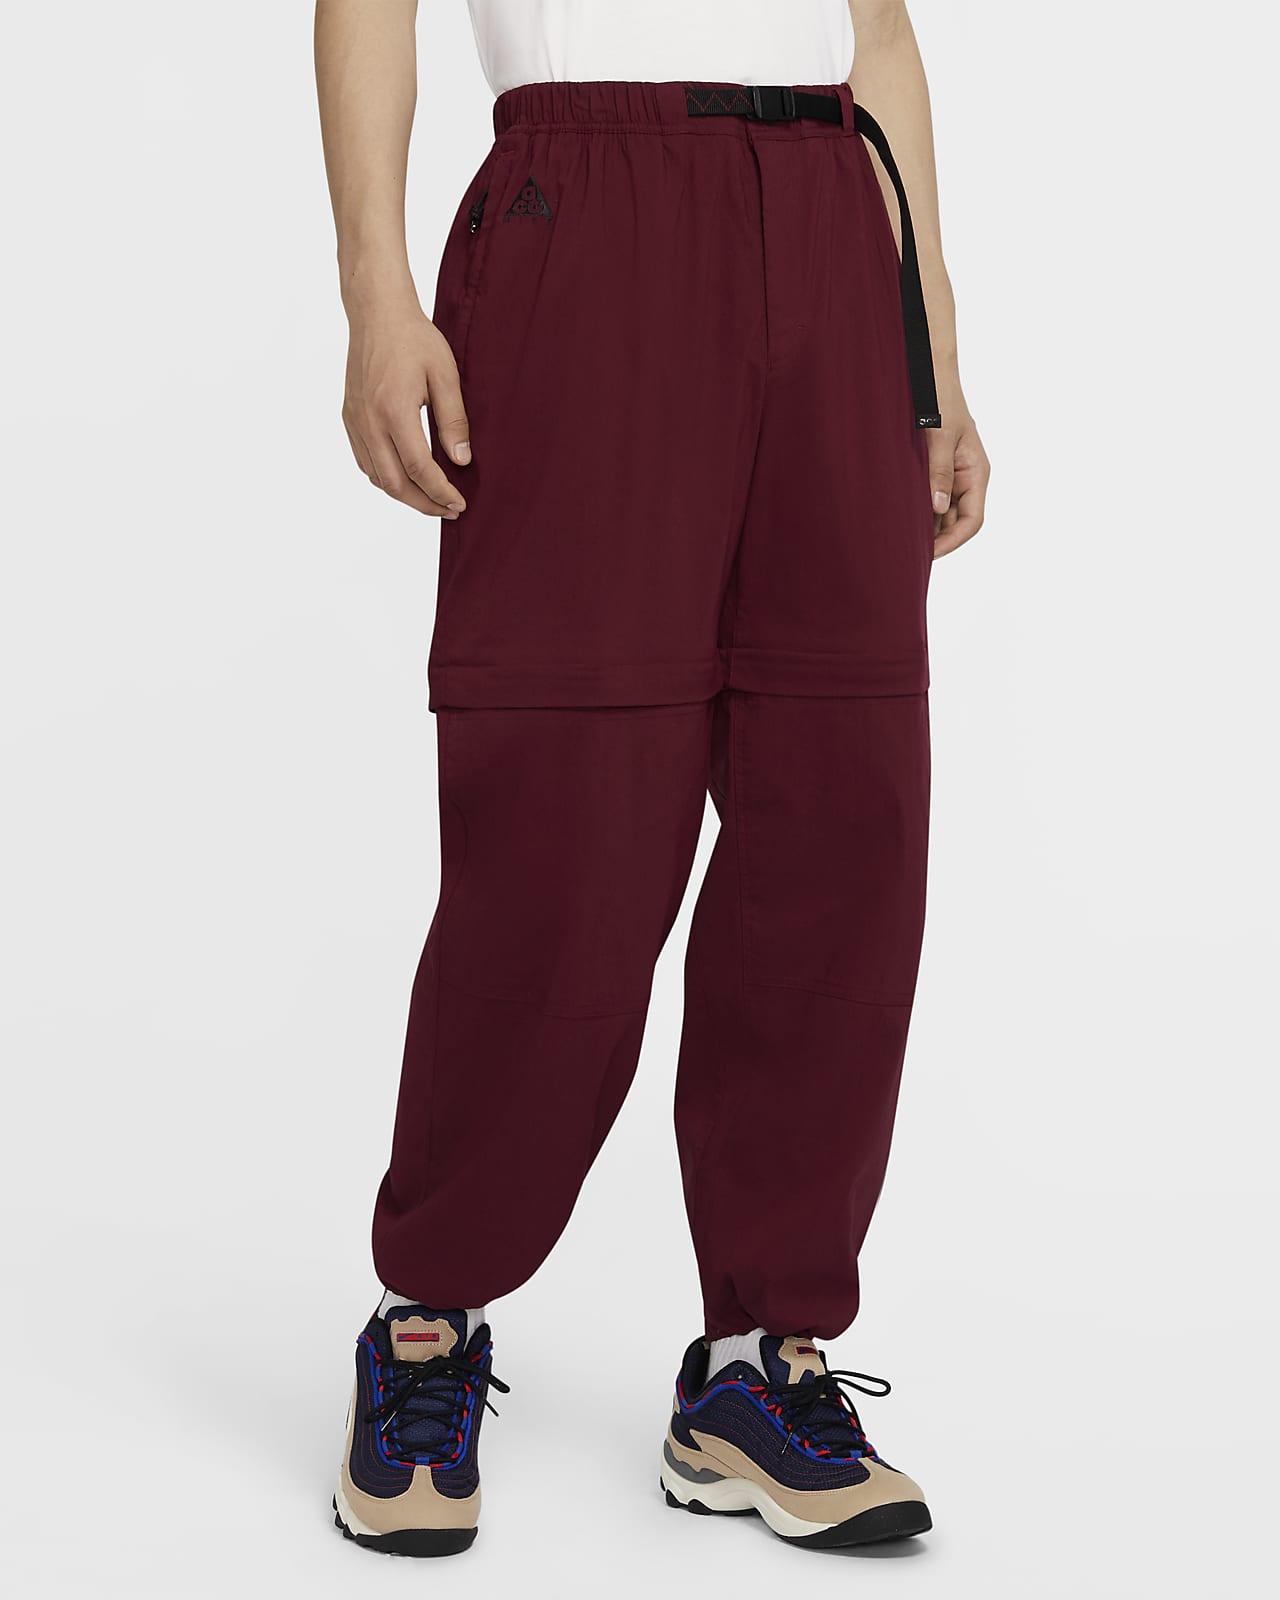 Nike AGG Convertible 男子长裤